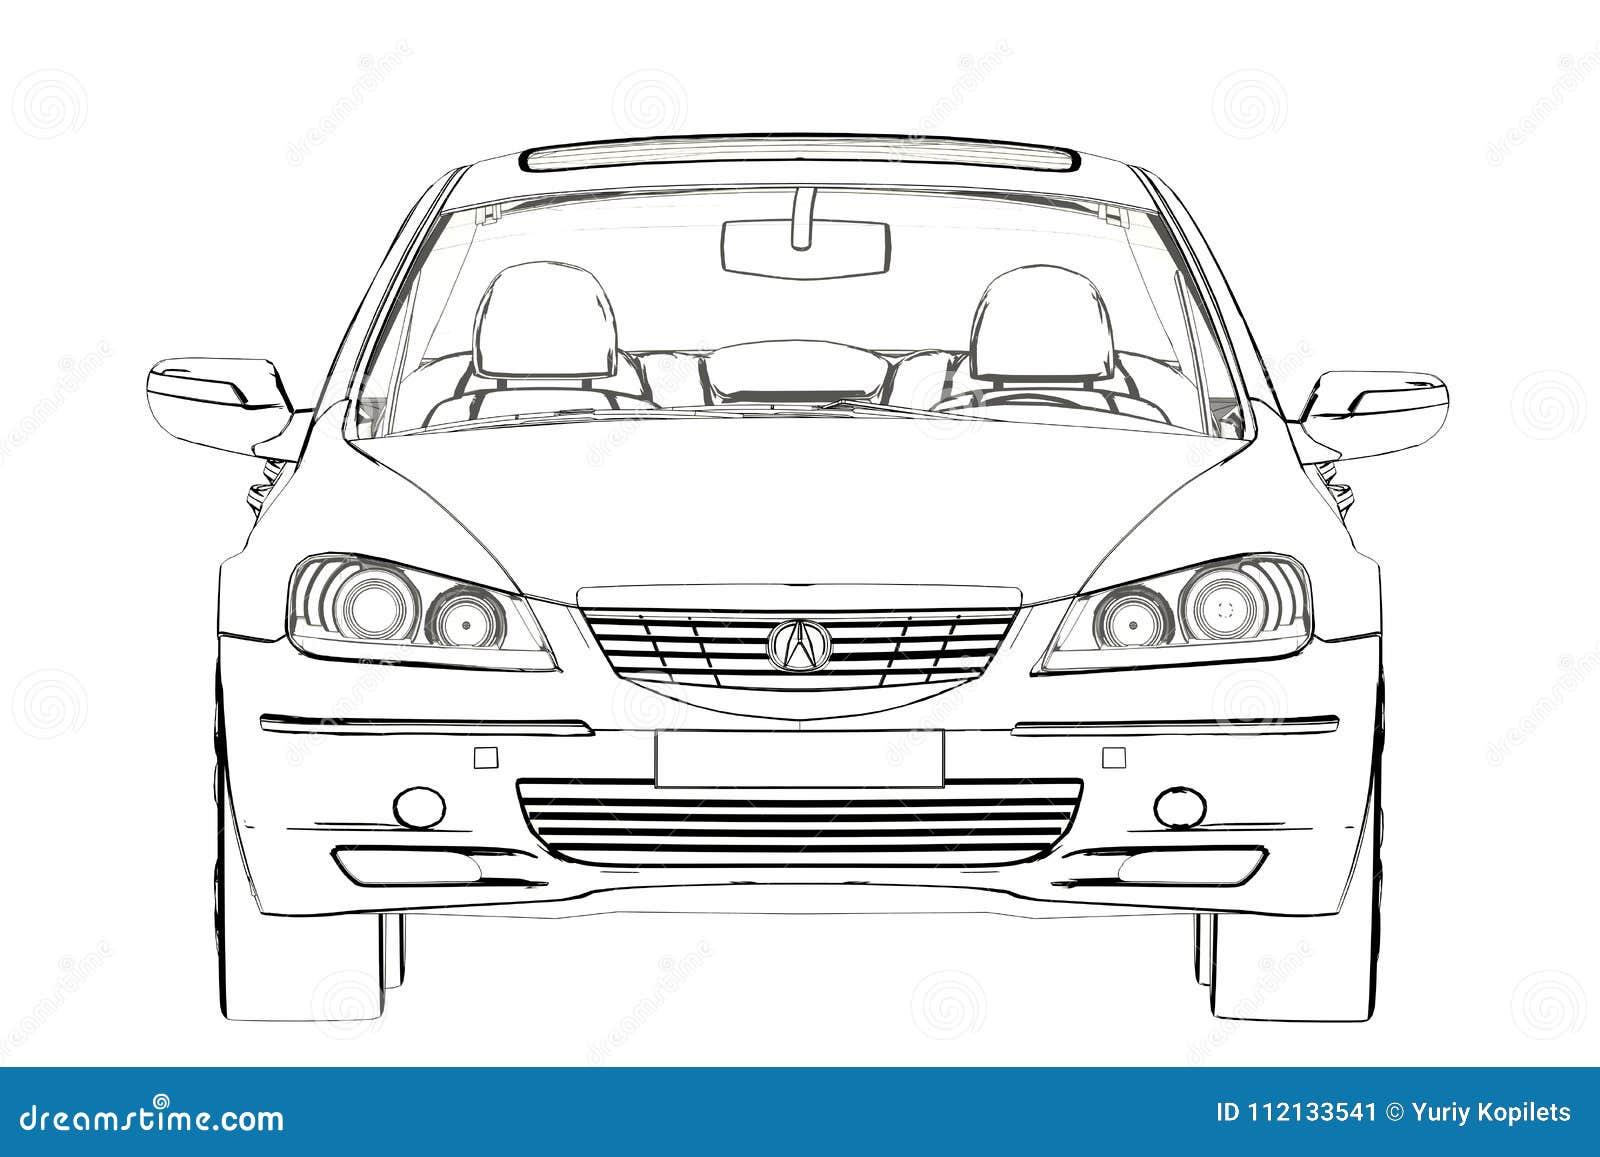 Luxury Car Acura Rl Sketch 3d Illustration Editorial Photo